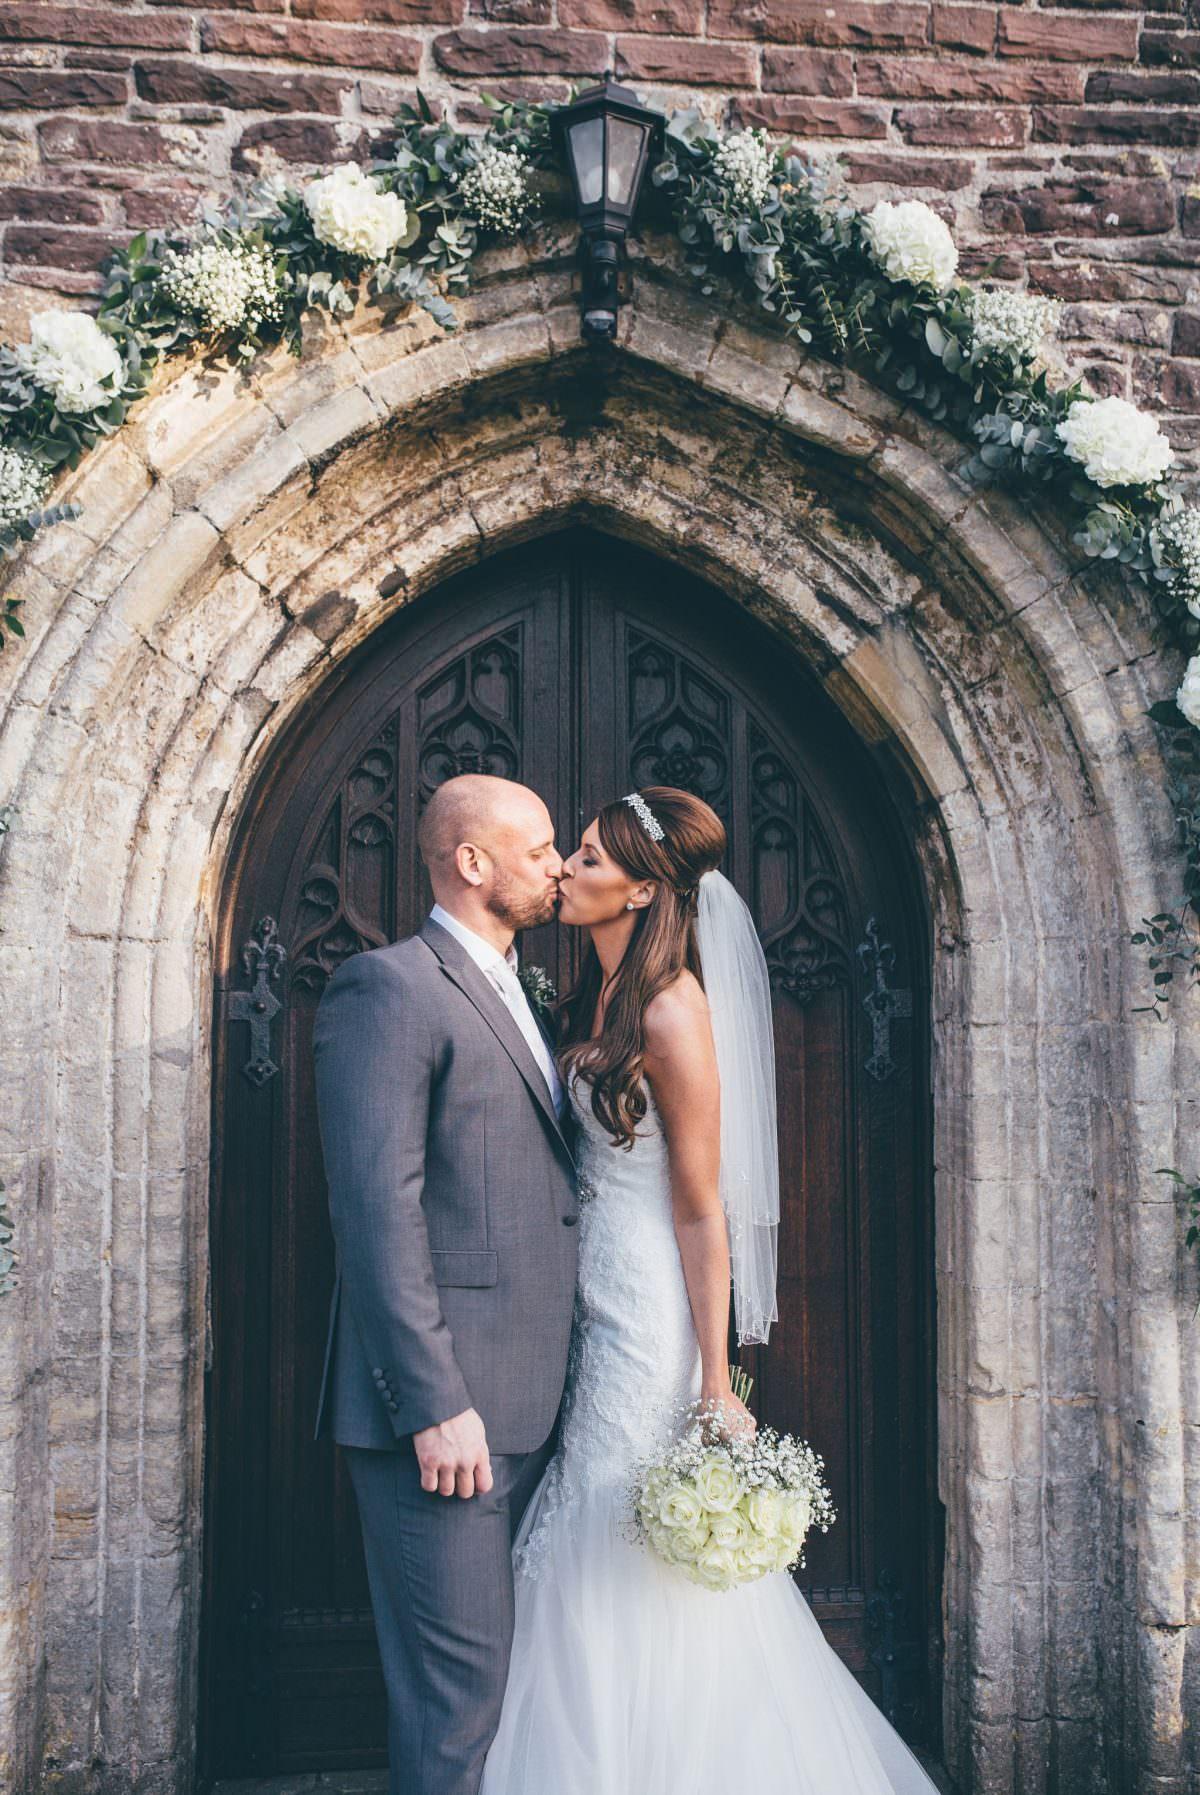 welsh_wedding_photographer_rachel_lambert_photography_decourceys_cardiff_rhiannon_gavin_ 36